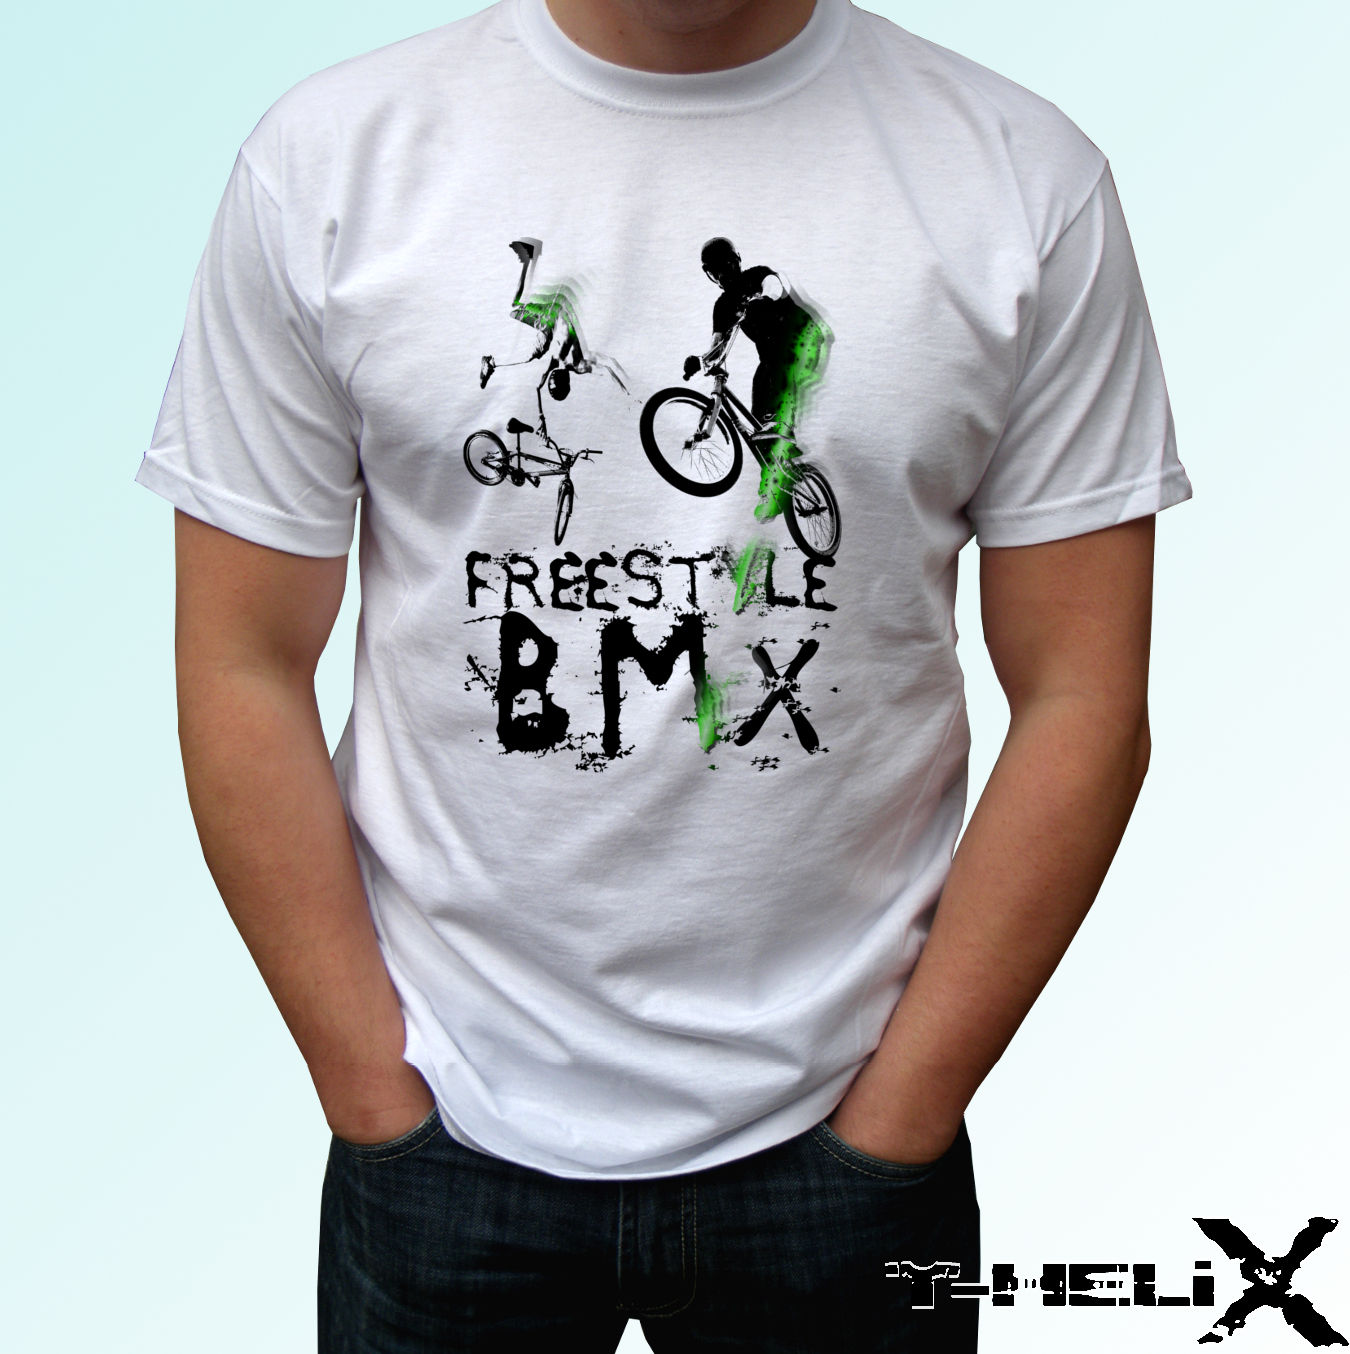 2961927e Freestyle BMX - white t shirt top sport design - mens womens kids baby sizes  Casual